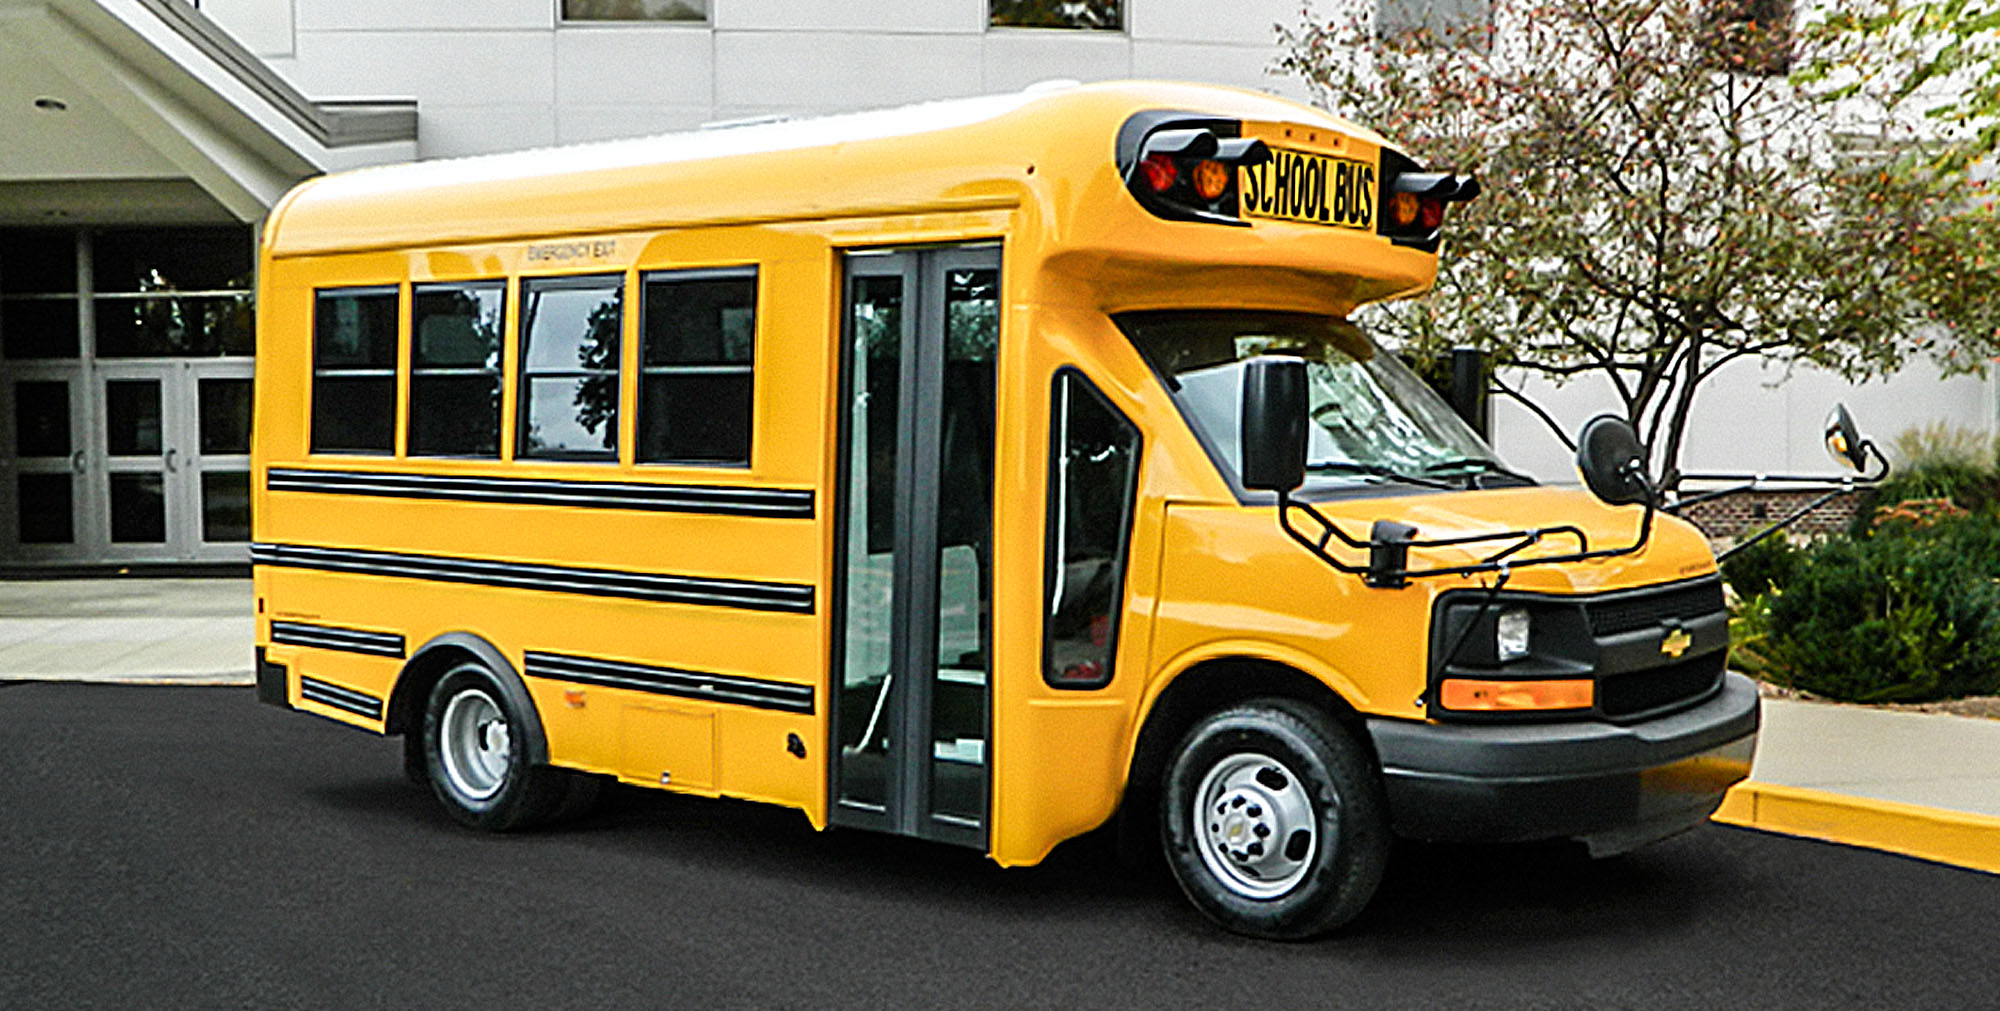 slideshow-schoolbus-type-a_questdrw3.jpg